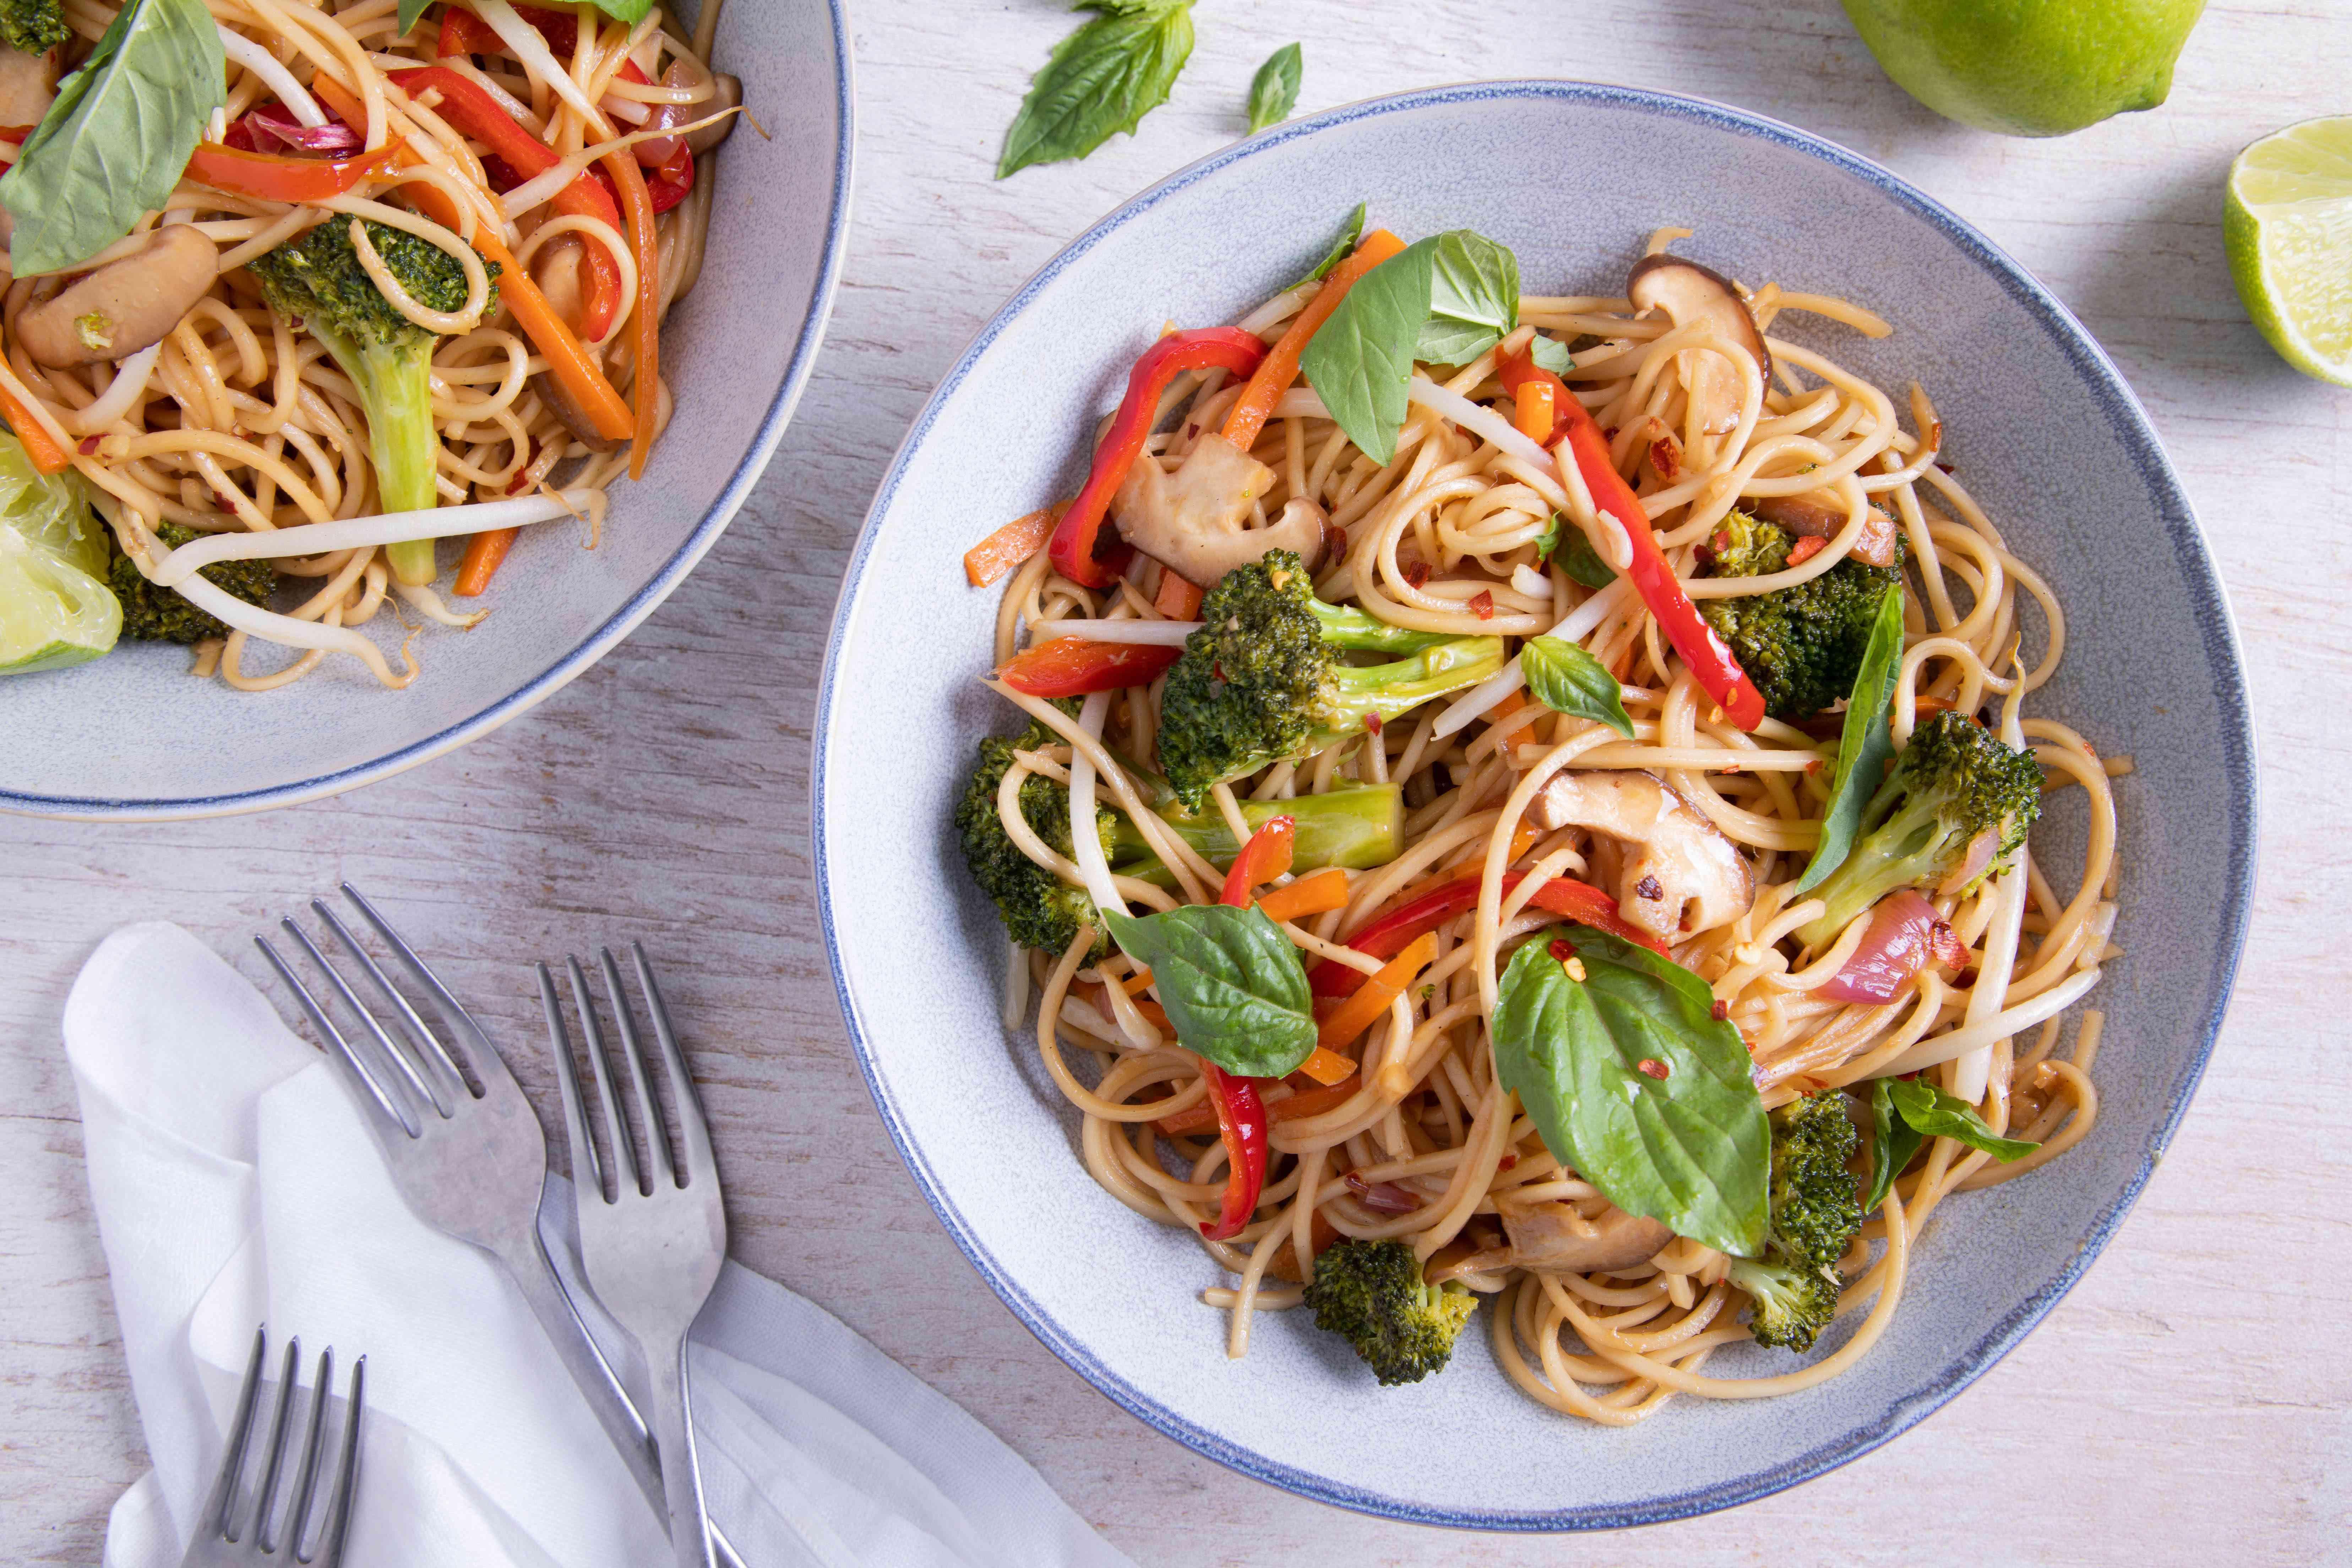 Thai stir fried noodle recipe